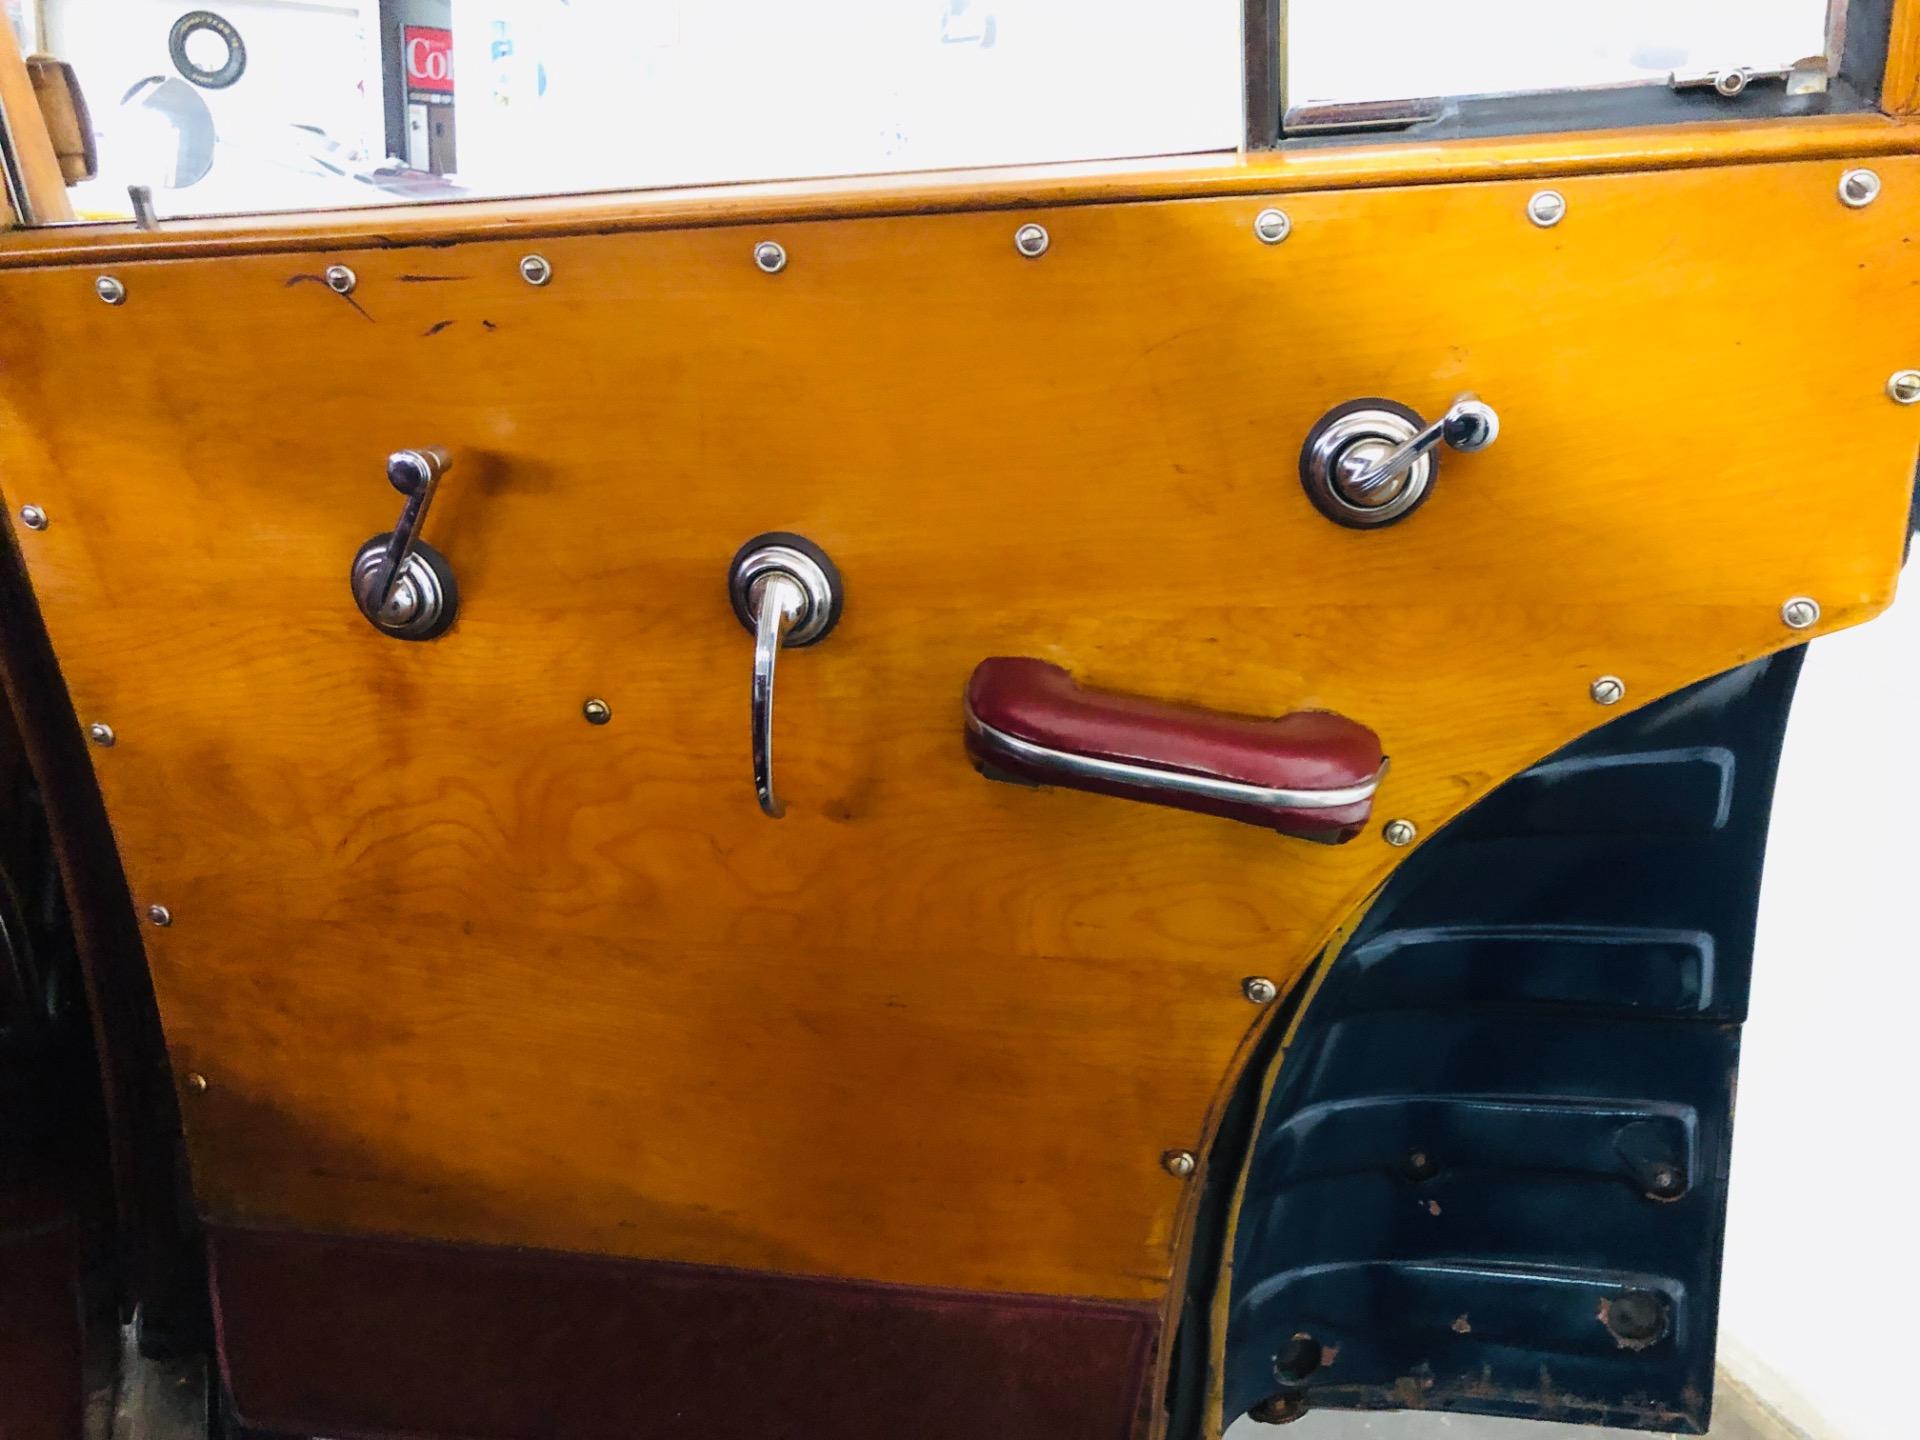 Used 1947 Buick Roadmaster -ESTATE WAGON - SUPER RARE WOODY - MECHANICALLY SOUND - FIREBALL 8 ENGINE | Mundelein, IL